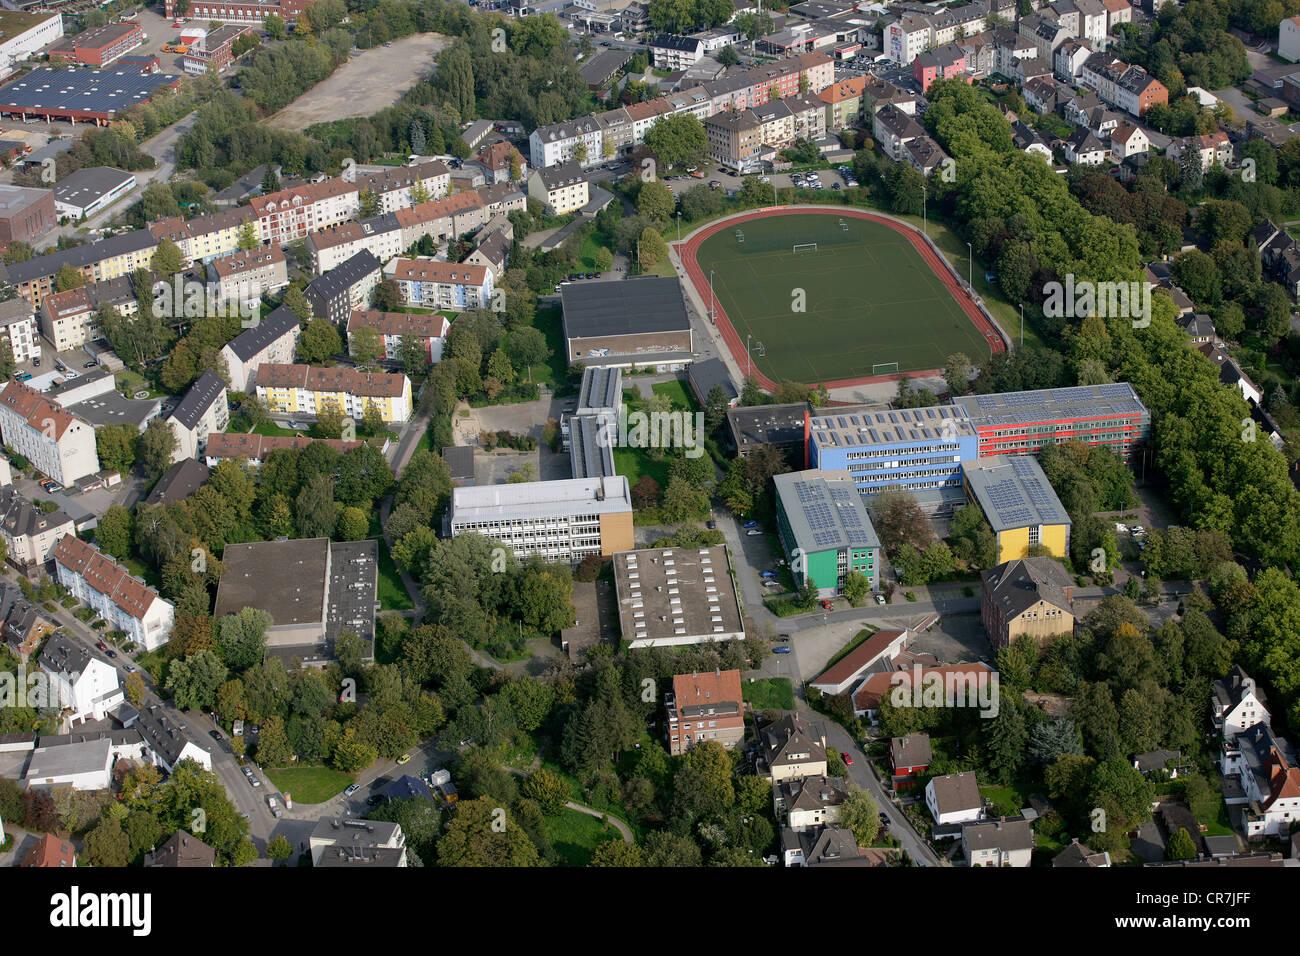 Aerial view, solar panels on roofs, vocational schools in Husemannstrasse, Witten, Ruhr Area, North Rhine-Westphalia - Stock Image